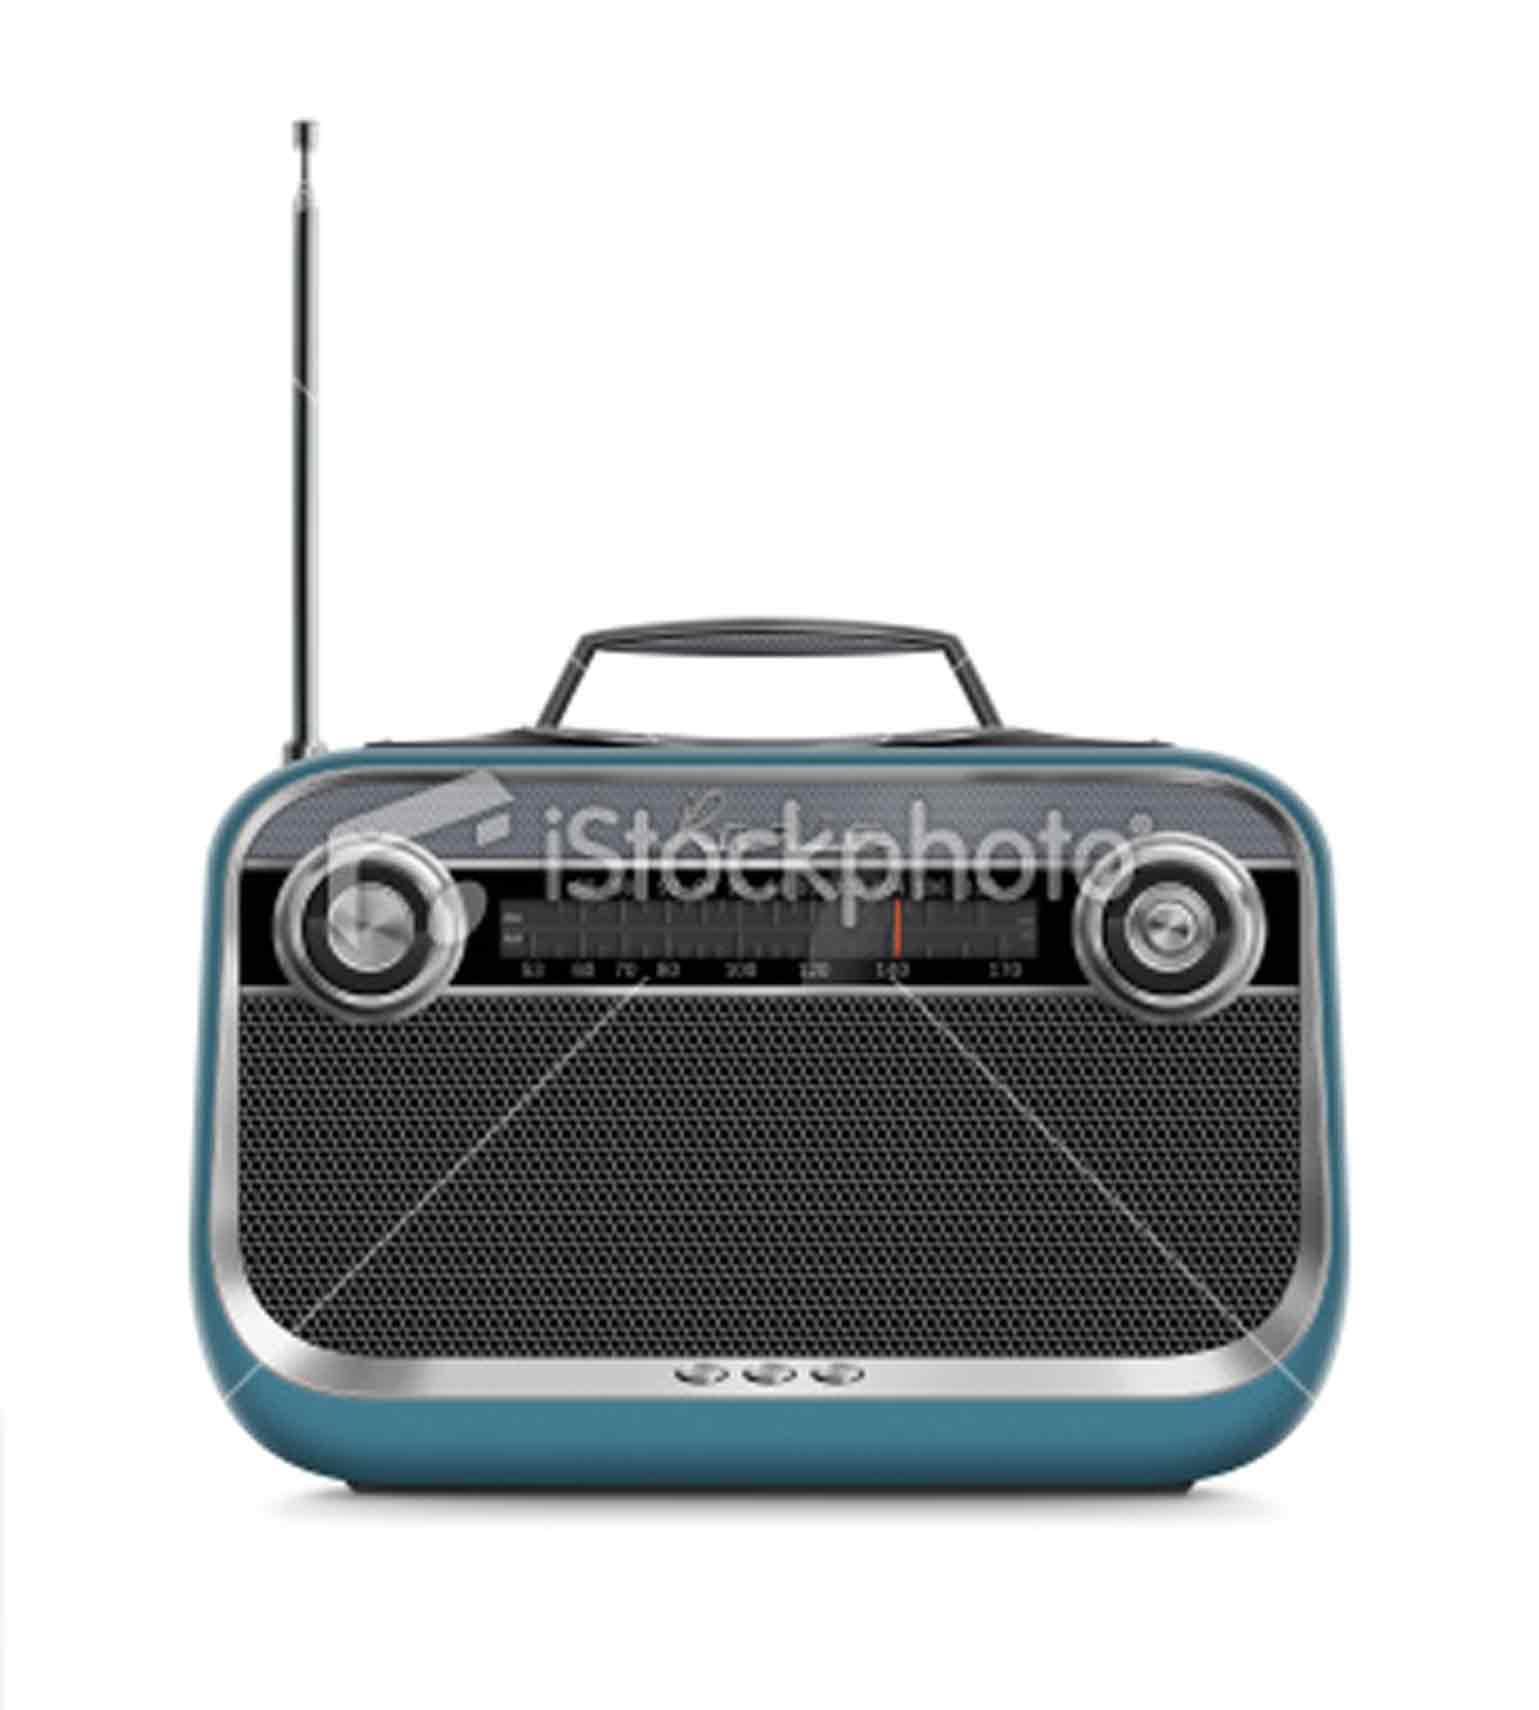 Stock Photo 19138689 Stylish Vintage Portable Radio